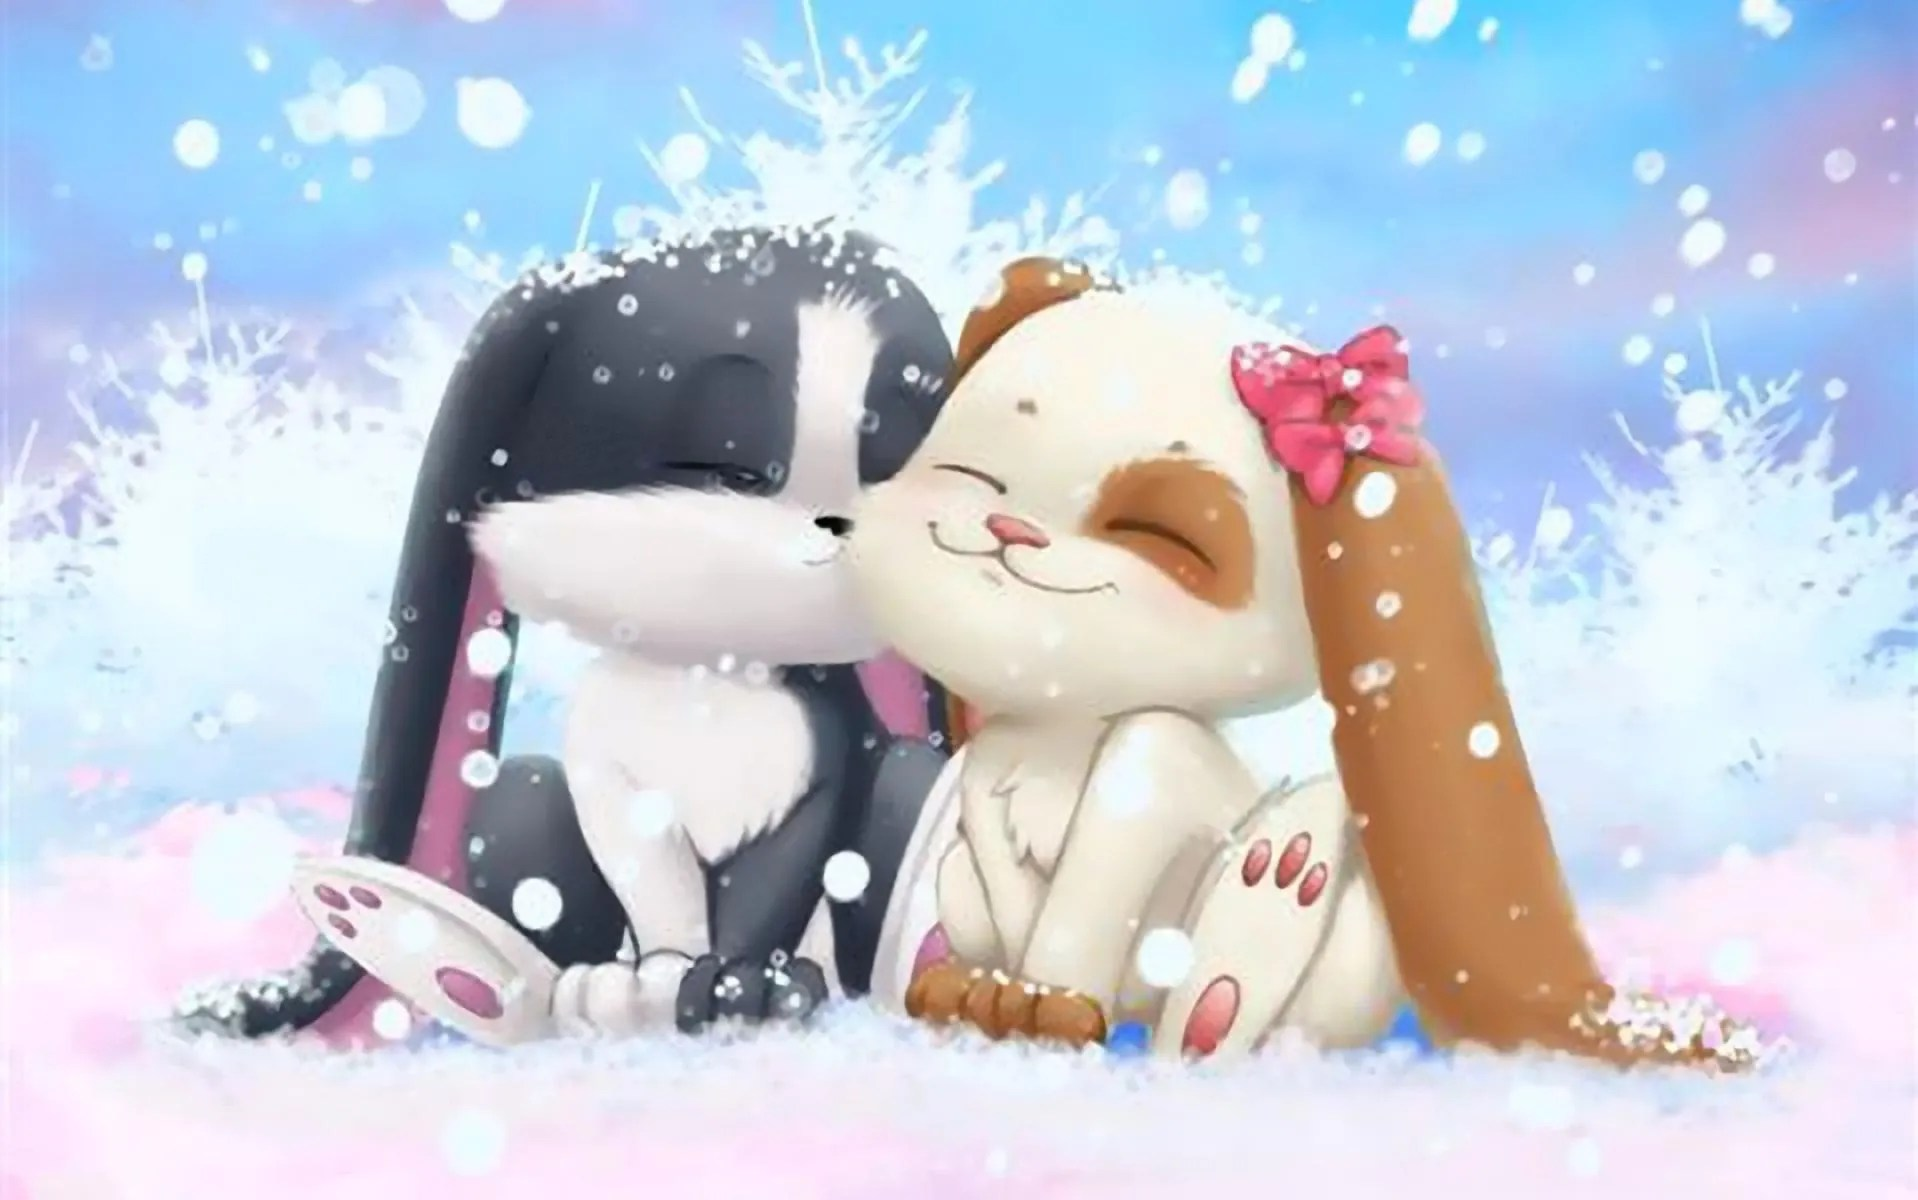 Cute Little Love Couple Hd Wallpaper Bunnies For Cuteness Image Links Tv Tropes